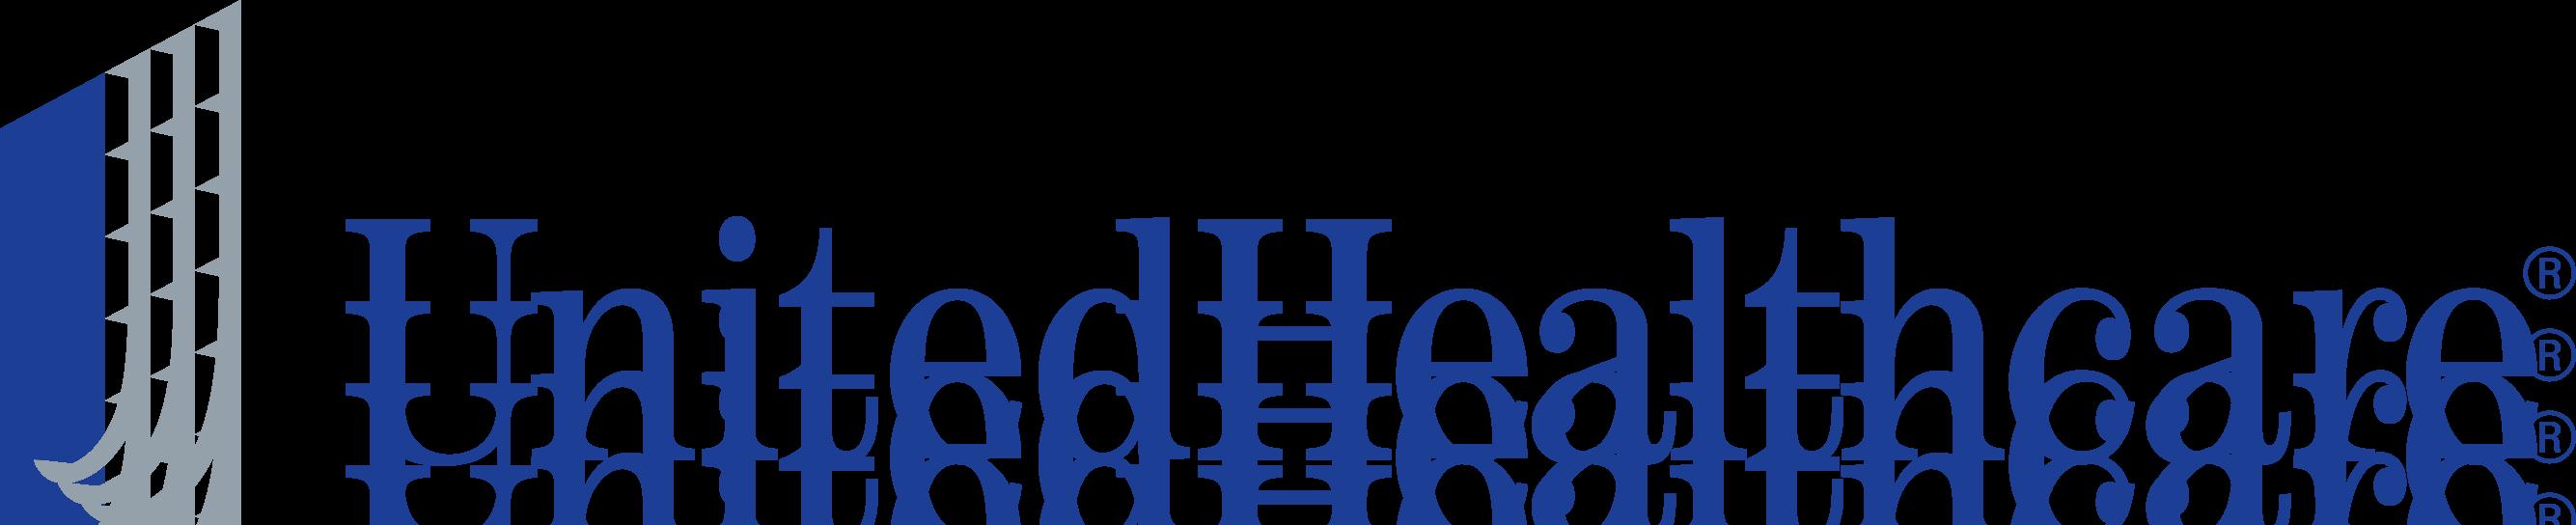 unitedhealth_logo.png